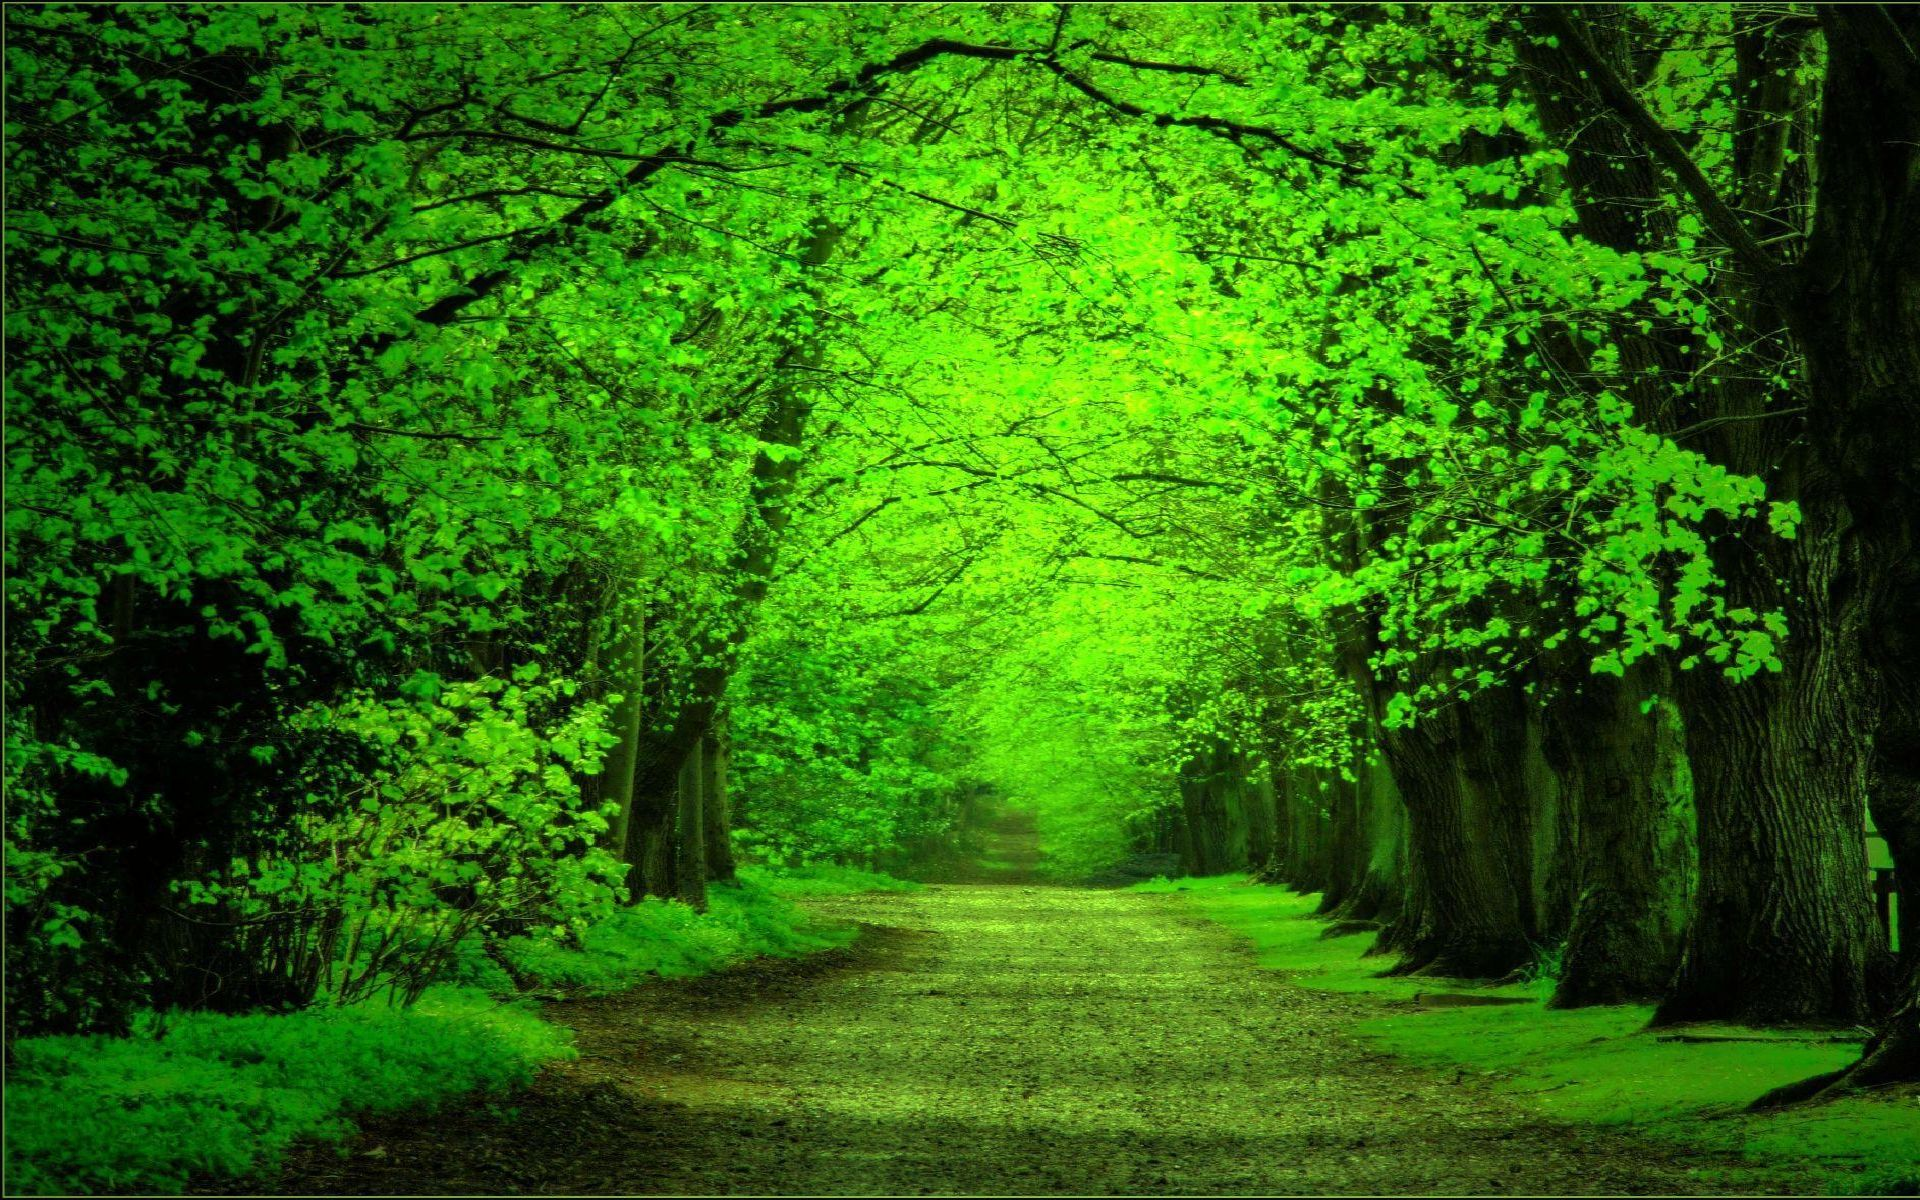 Green Forest Wallpaper Photos Background plu5998c Yoanu 1920x1200